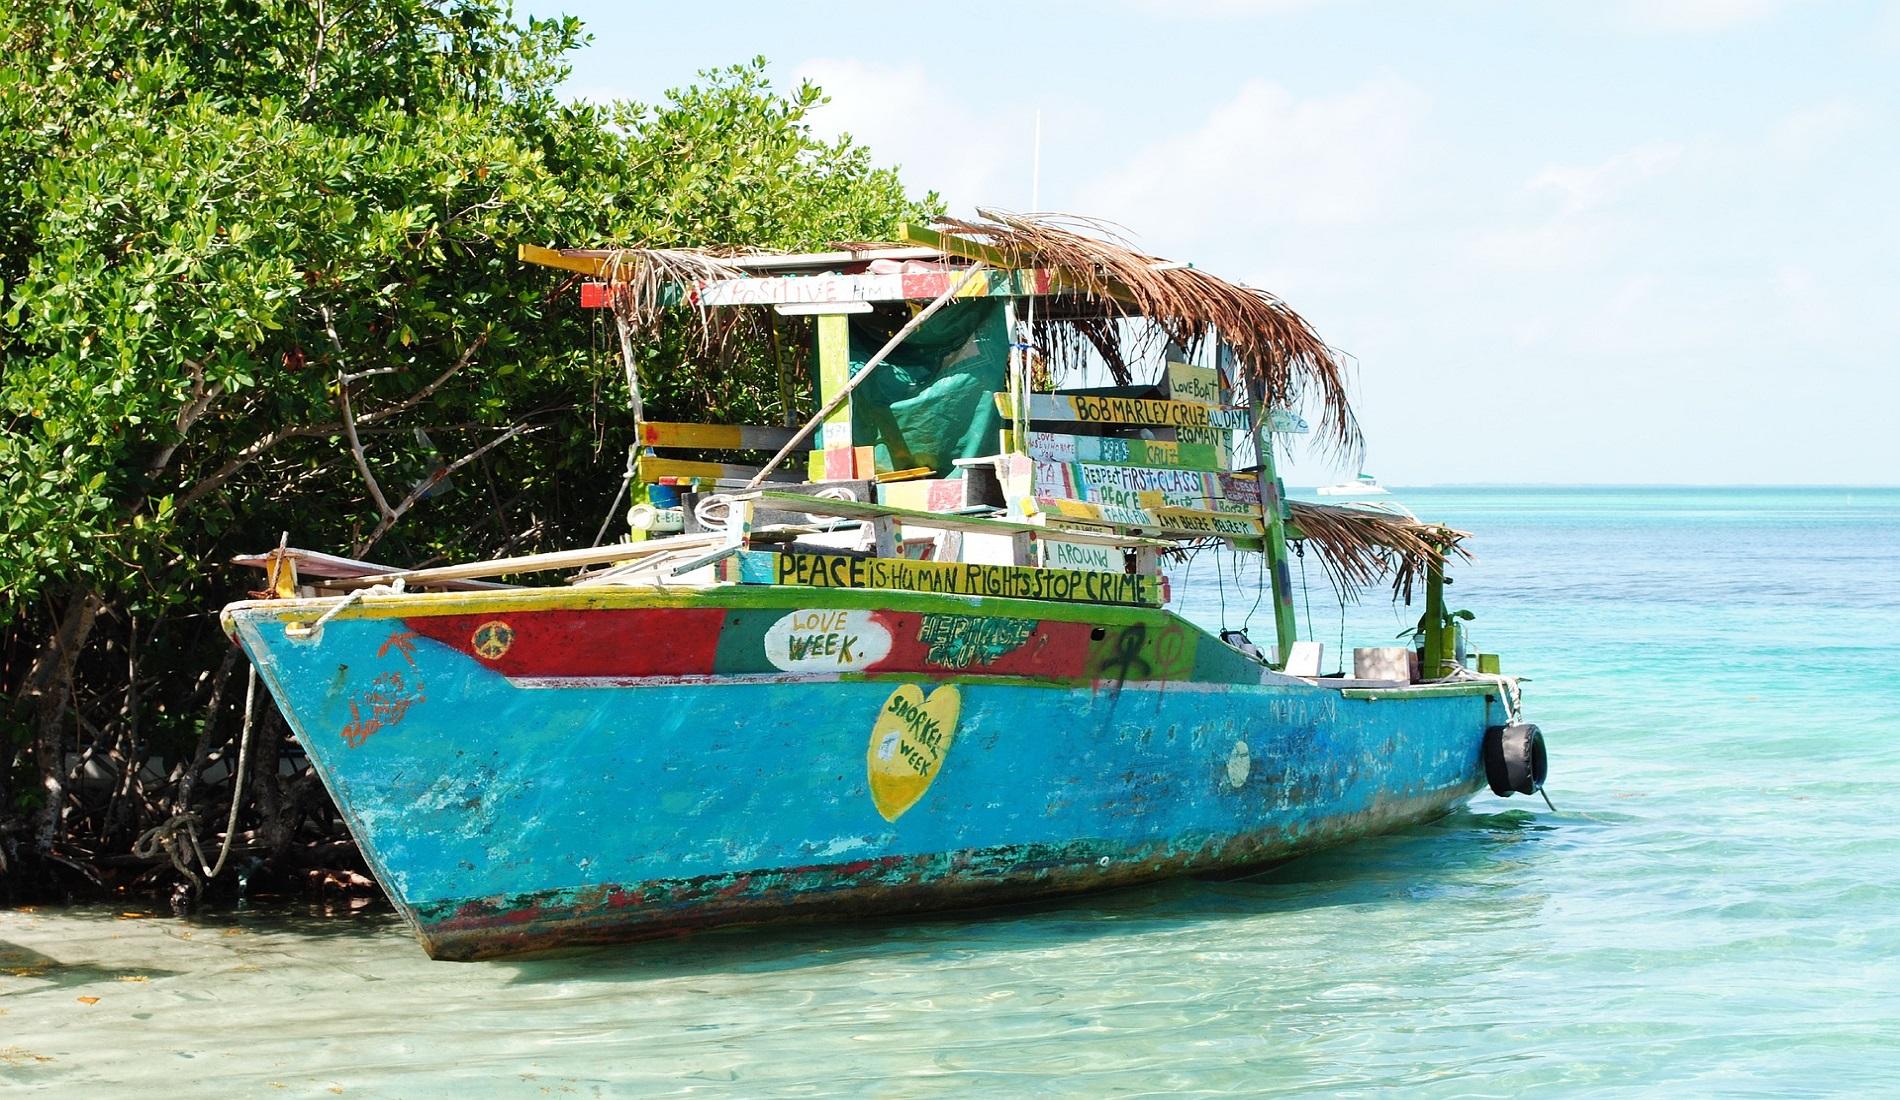 Rondreis Belize Caye Caulker